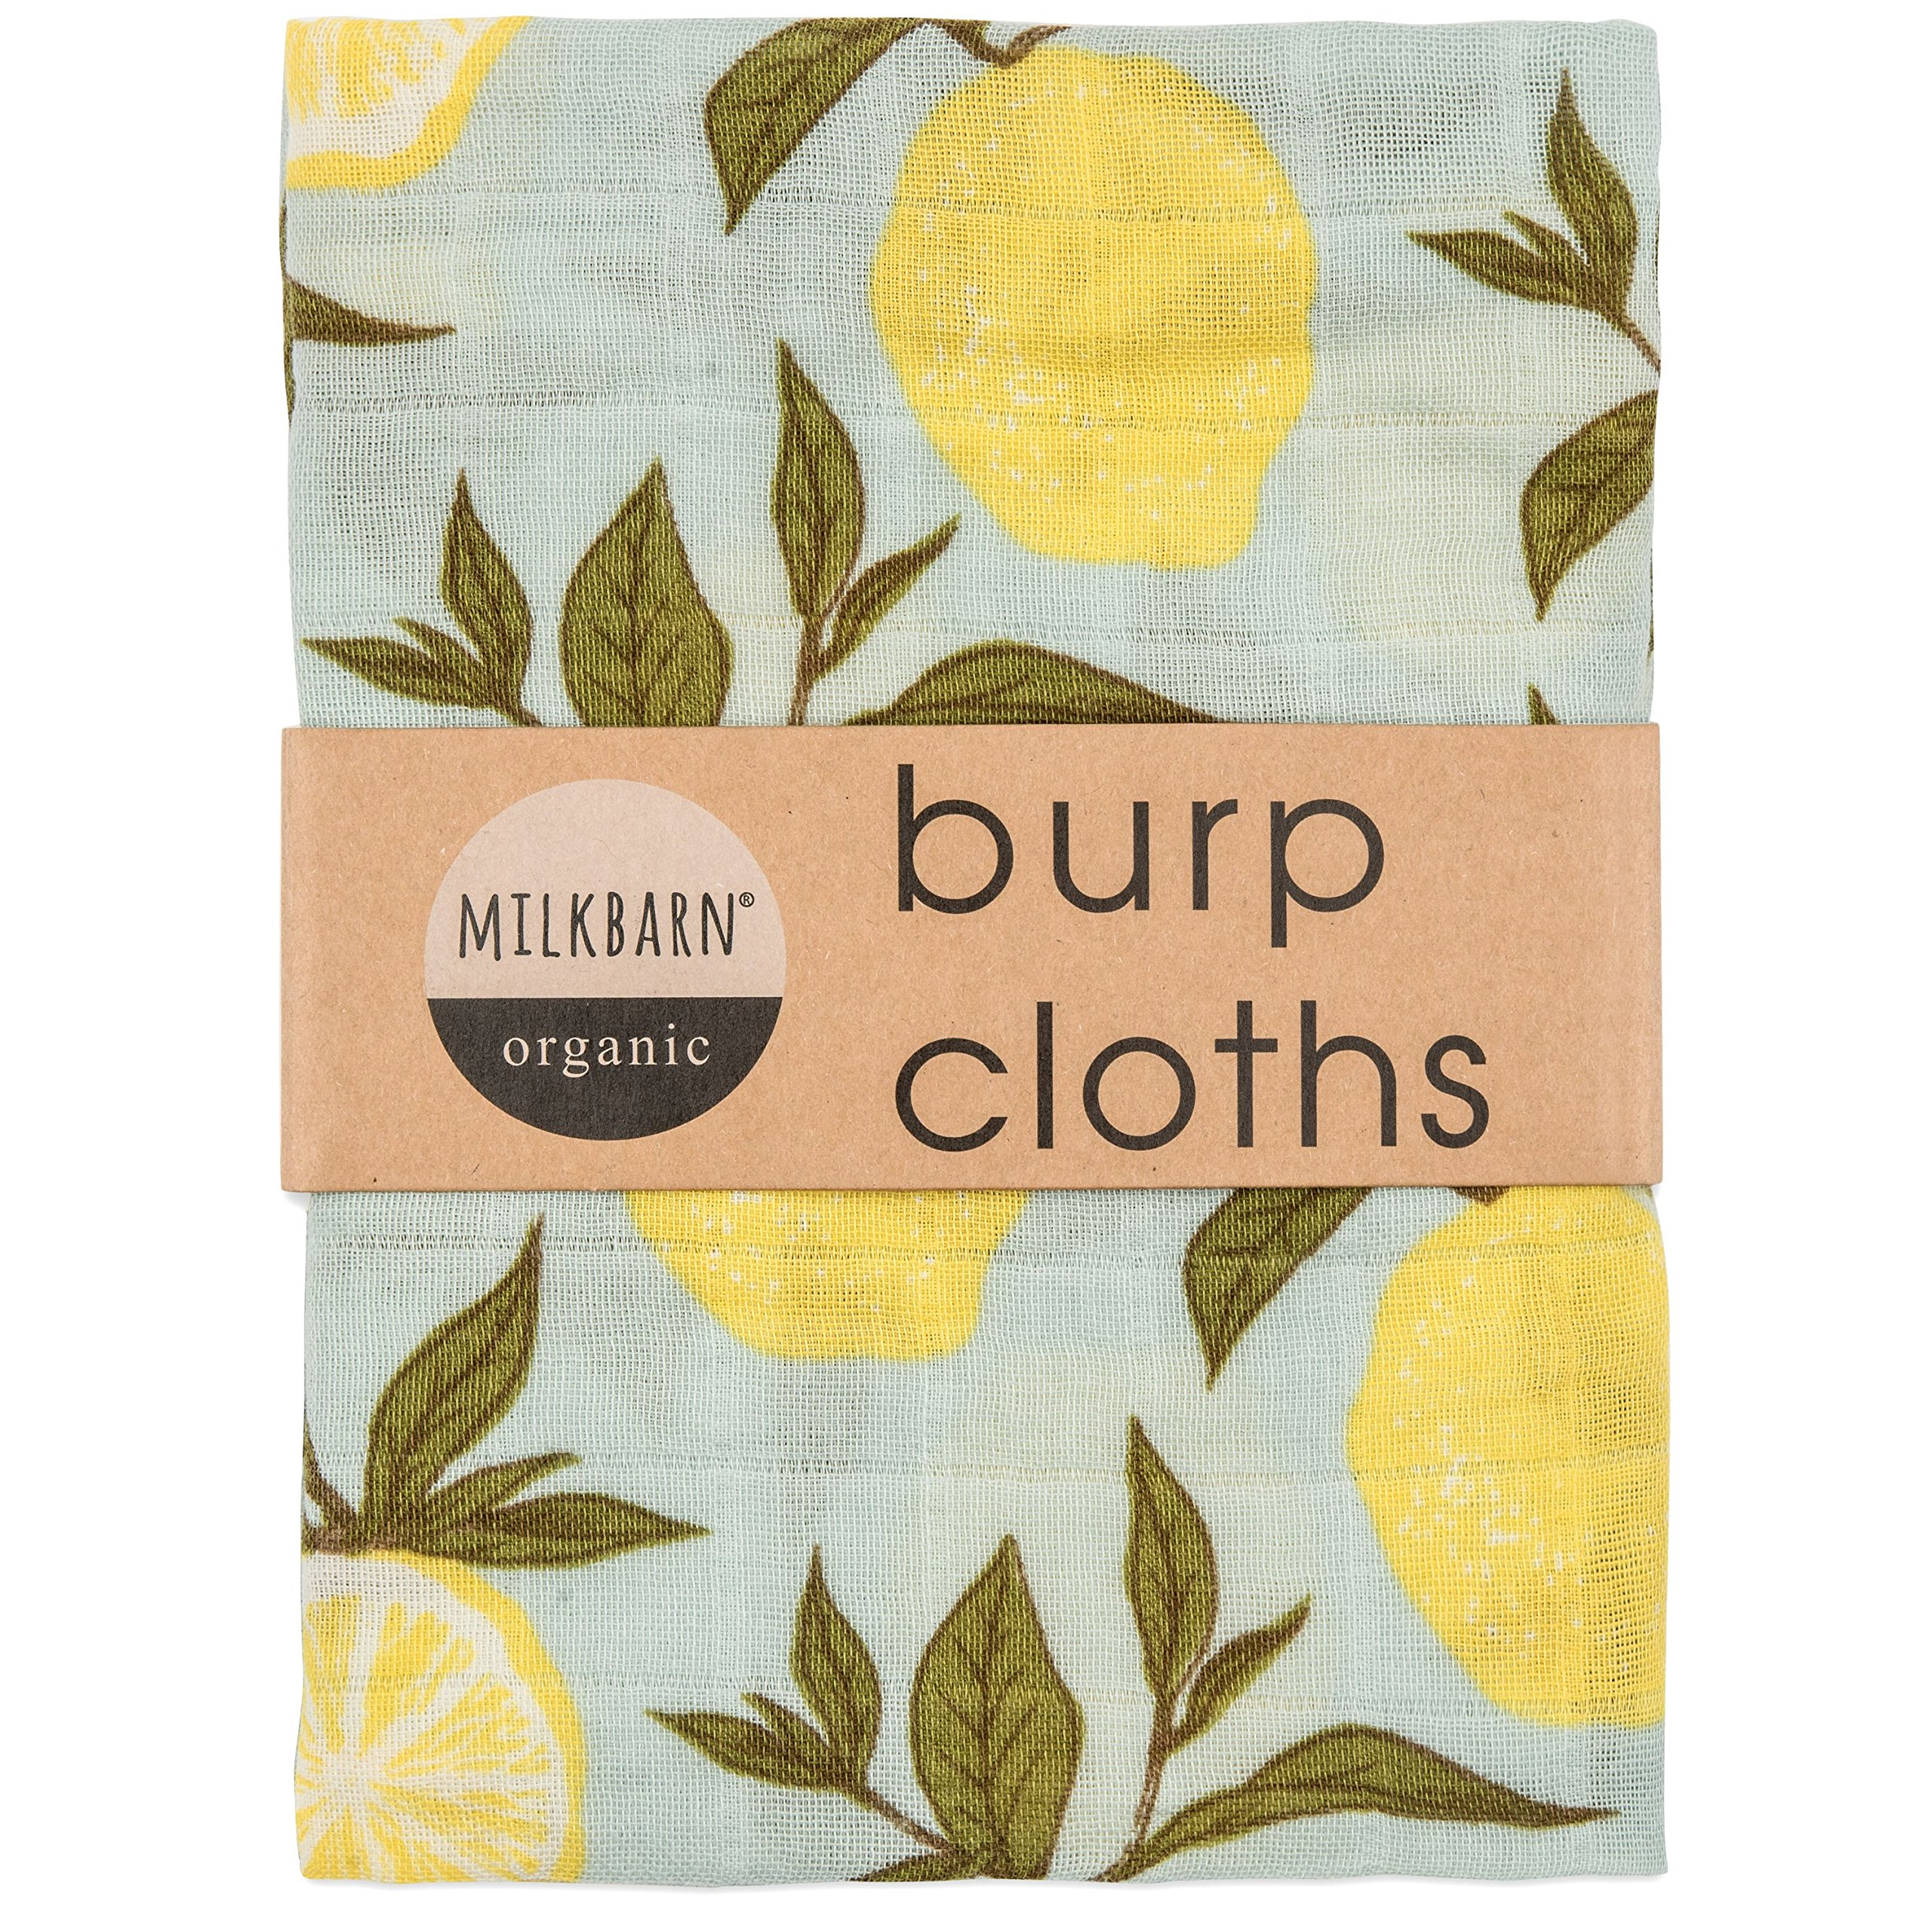 Milkbarn Organic Cotton Burp Cloths (2 pack) (Blue lemon), 23''x23'' by MilkBarn